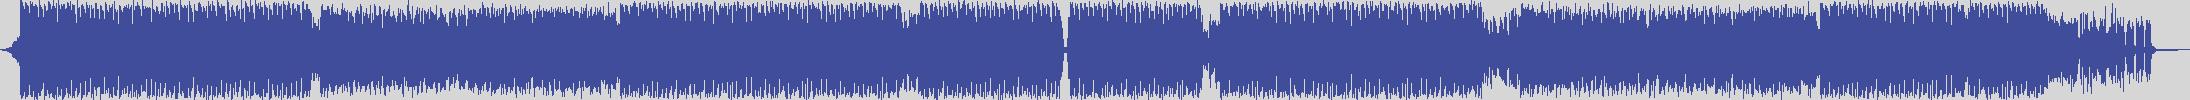 smilax_dig_records [Smilax_X448DIG] Danilo Seclì, Santoro, Bovino, Cesko From Après La Classe, Puccia From Après La Classe - Por La Noche [Radio Version] audio wave form